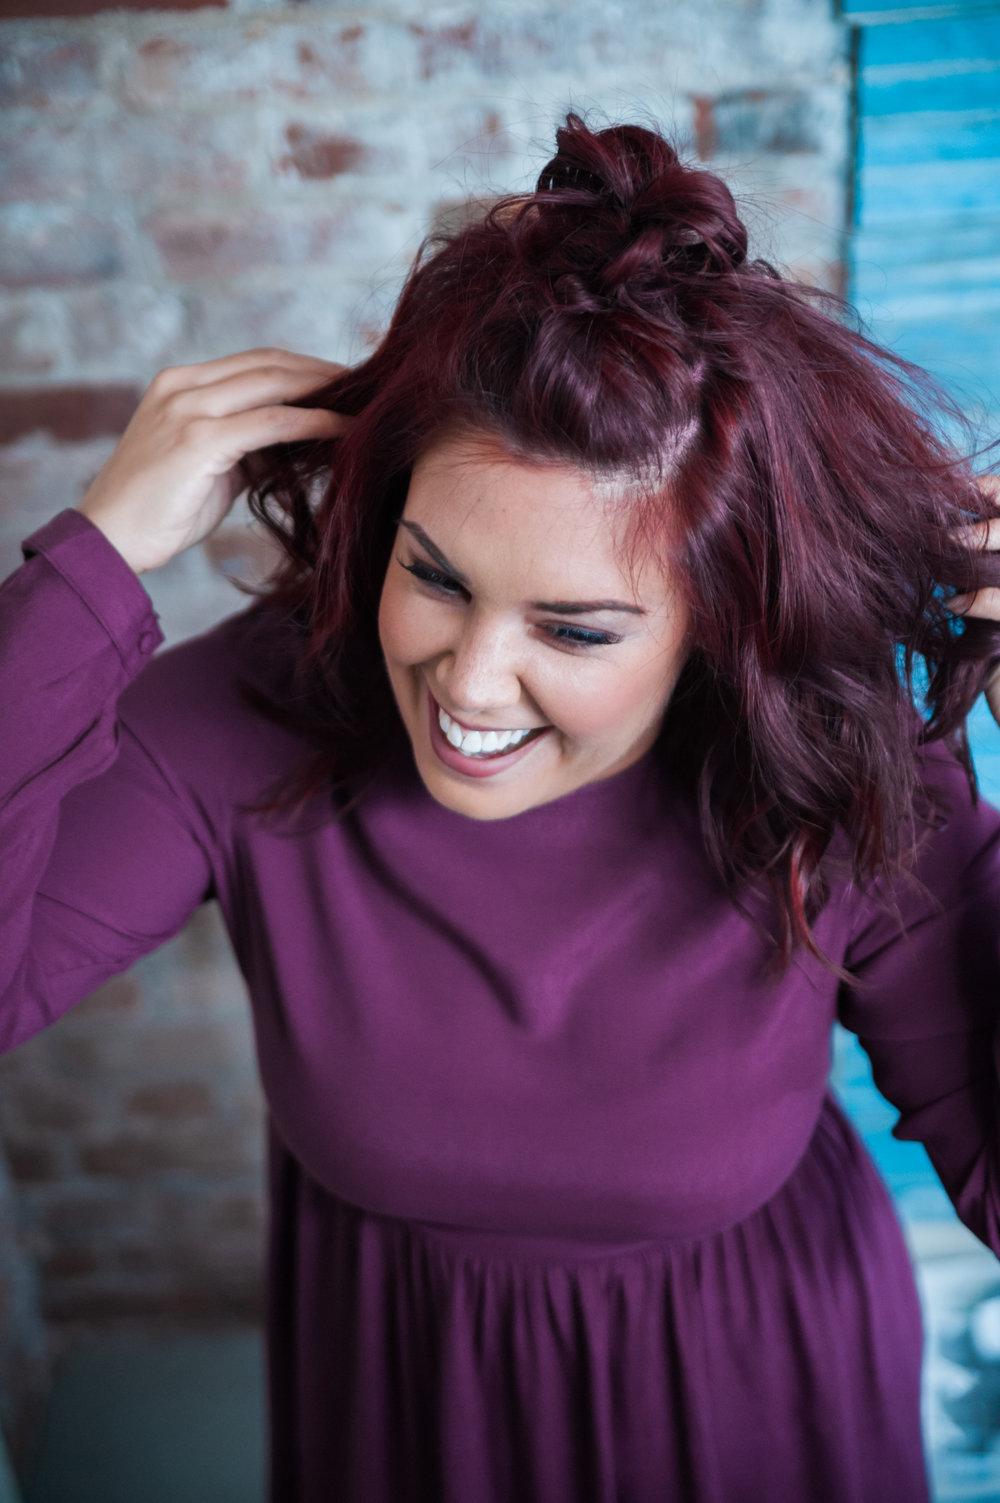 Hair With Hanna Johnna Nedreberg Photography for Love IT! Evv Magazine